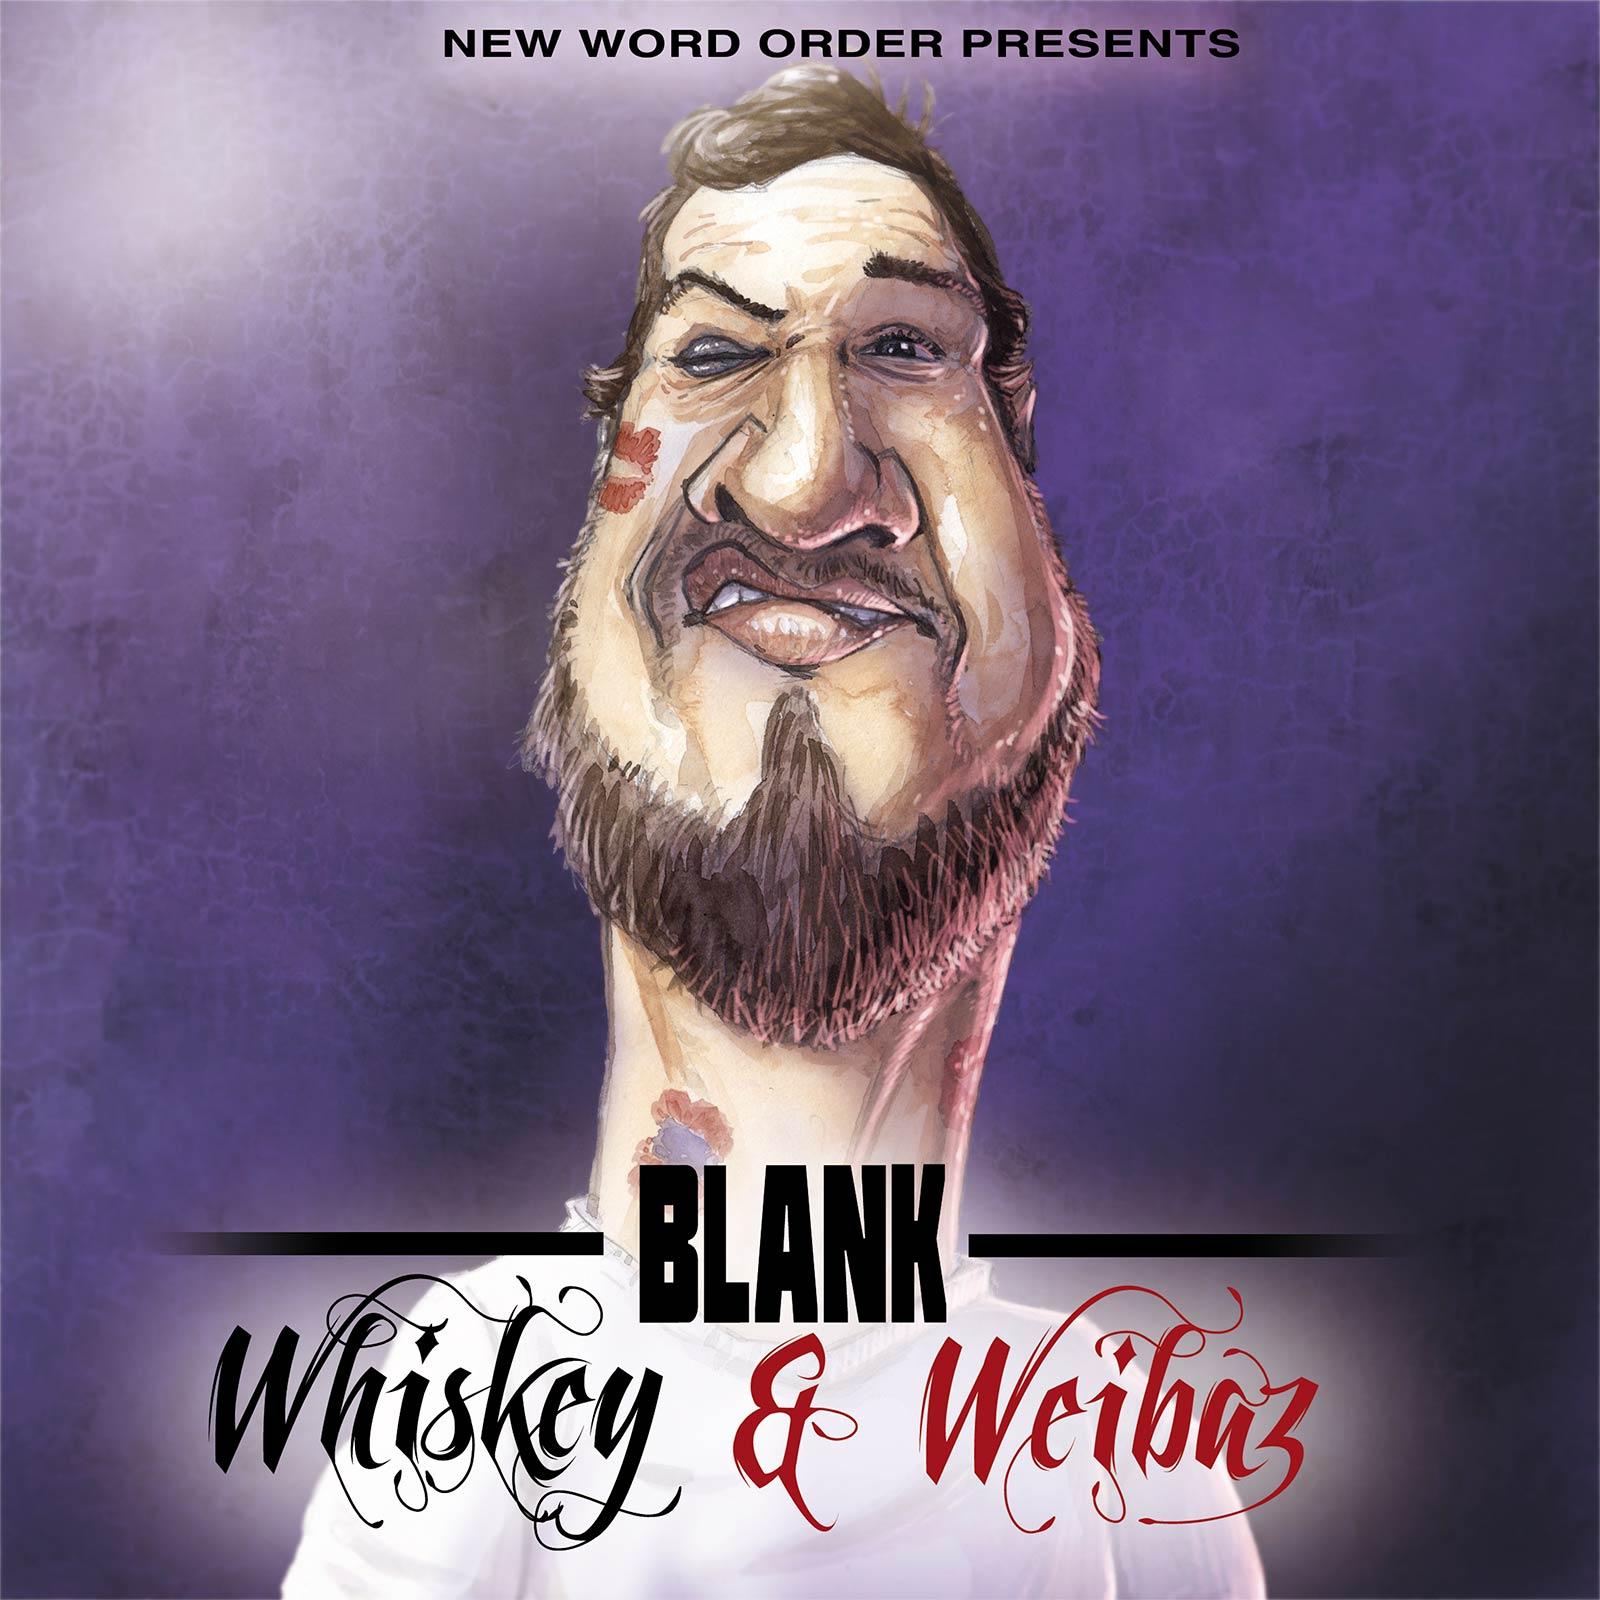 Upcoming: Blank - Whiskey & Weibaz (Album)